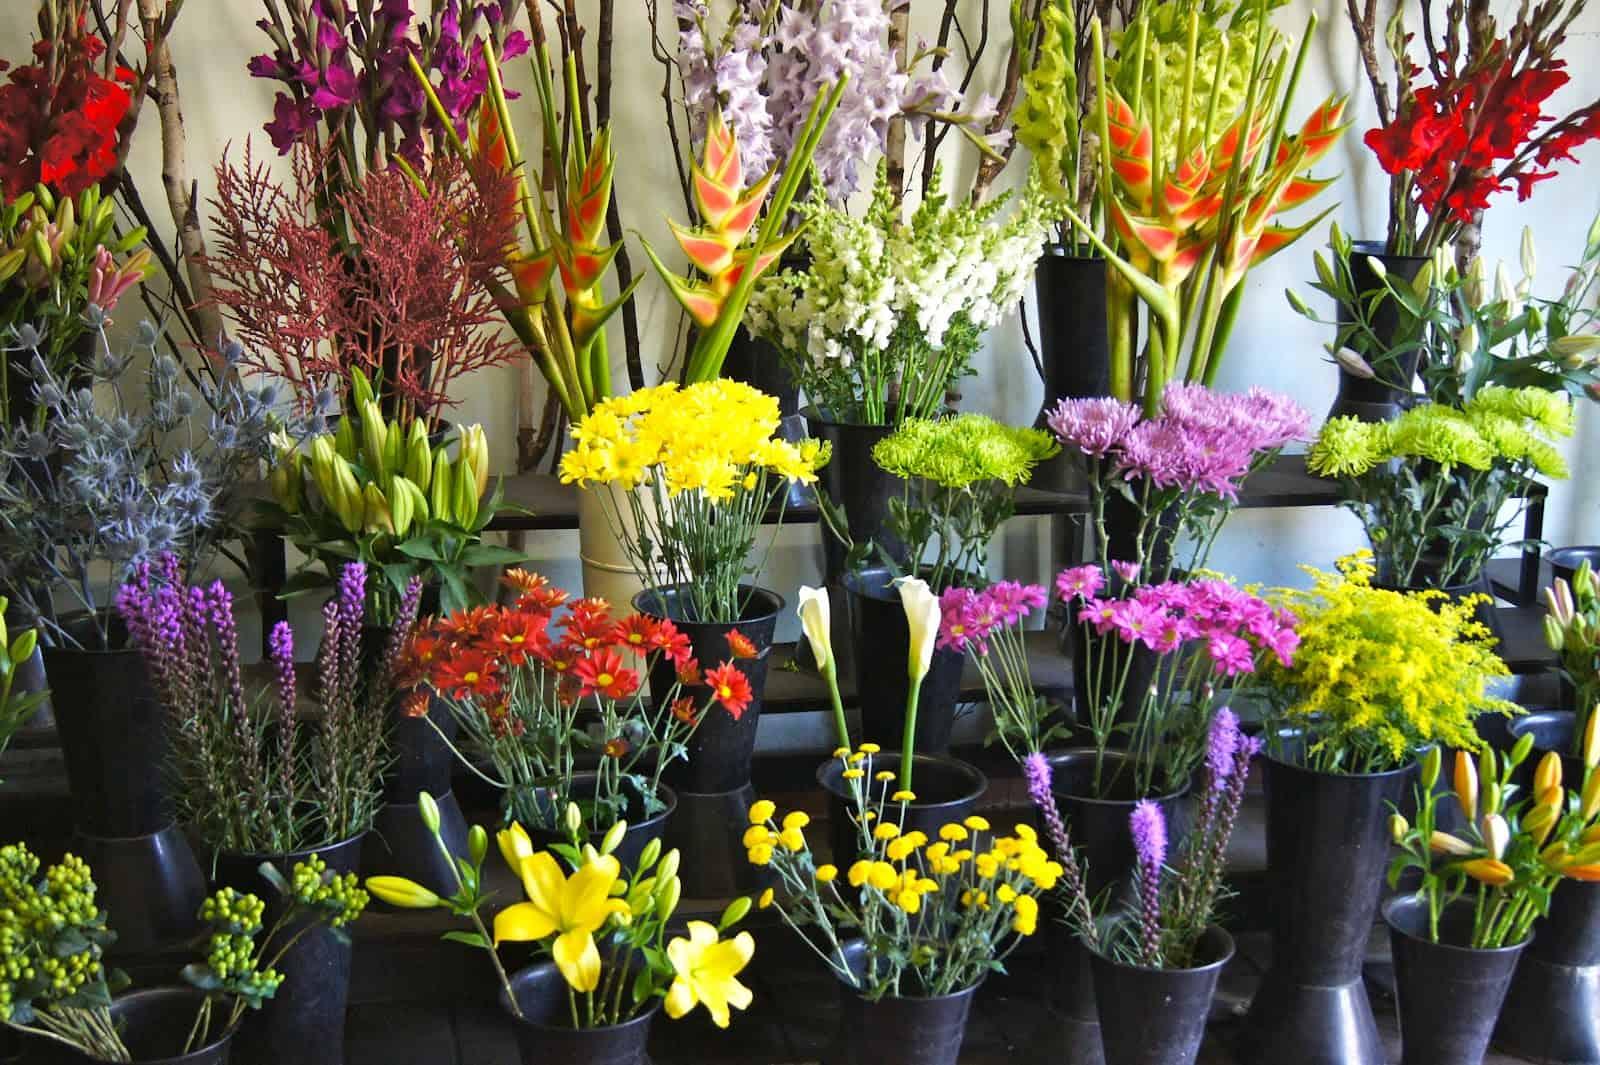 Wholesale Flowers in buckets Wholesale Wedding Flowers Blog